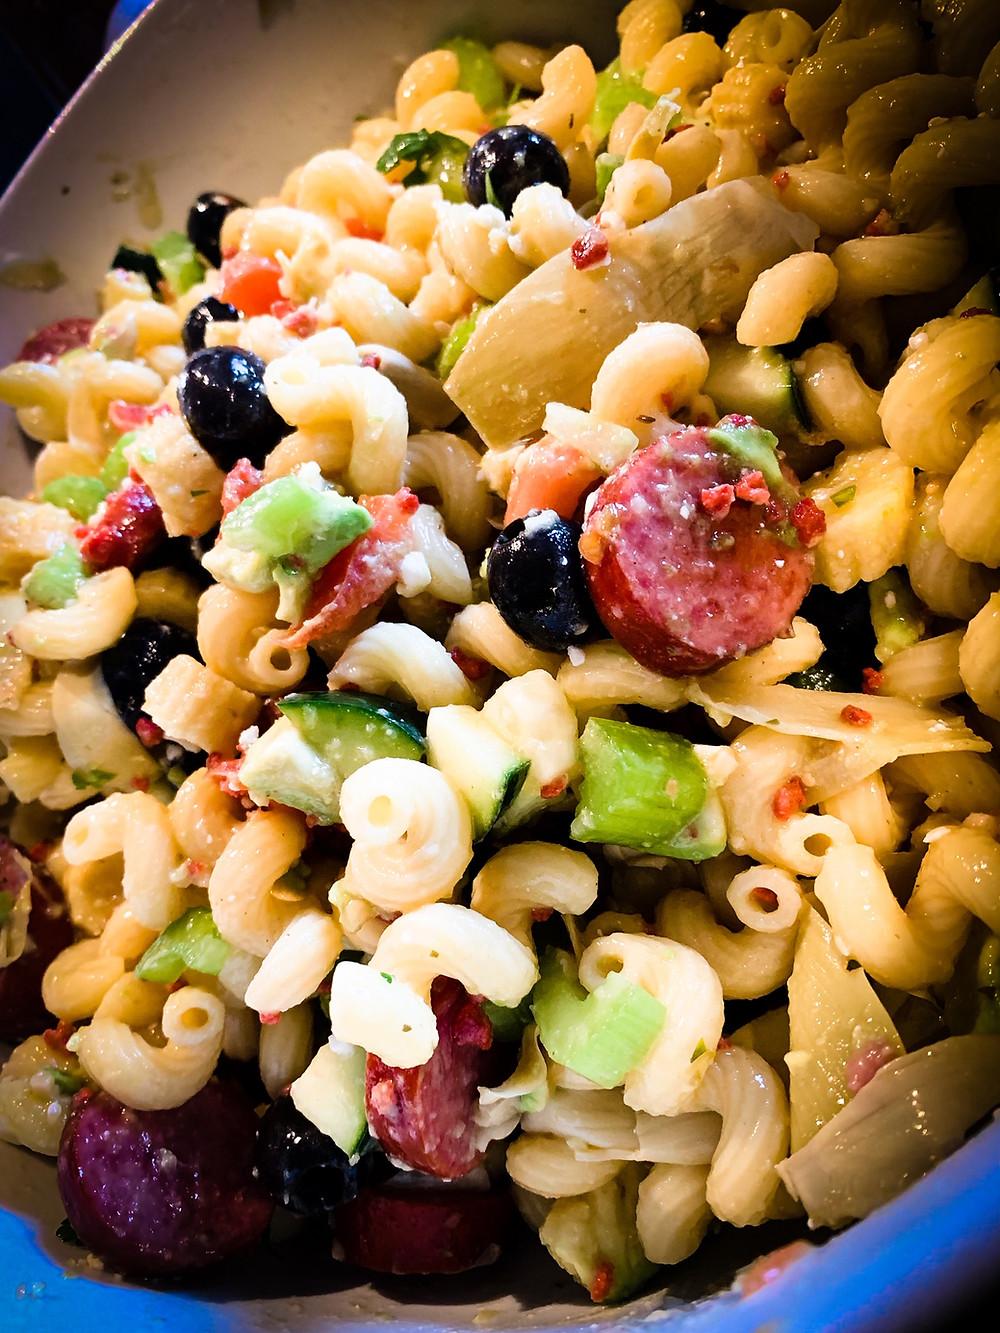 Tomatillo Hot Sauce Pasta Salad Recipe